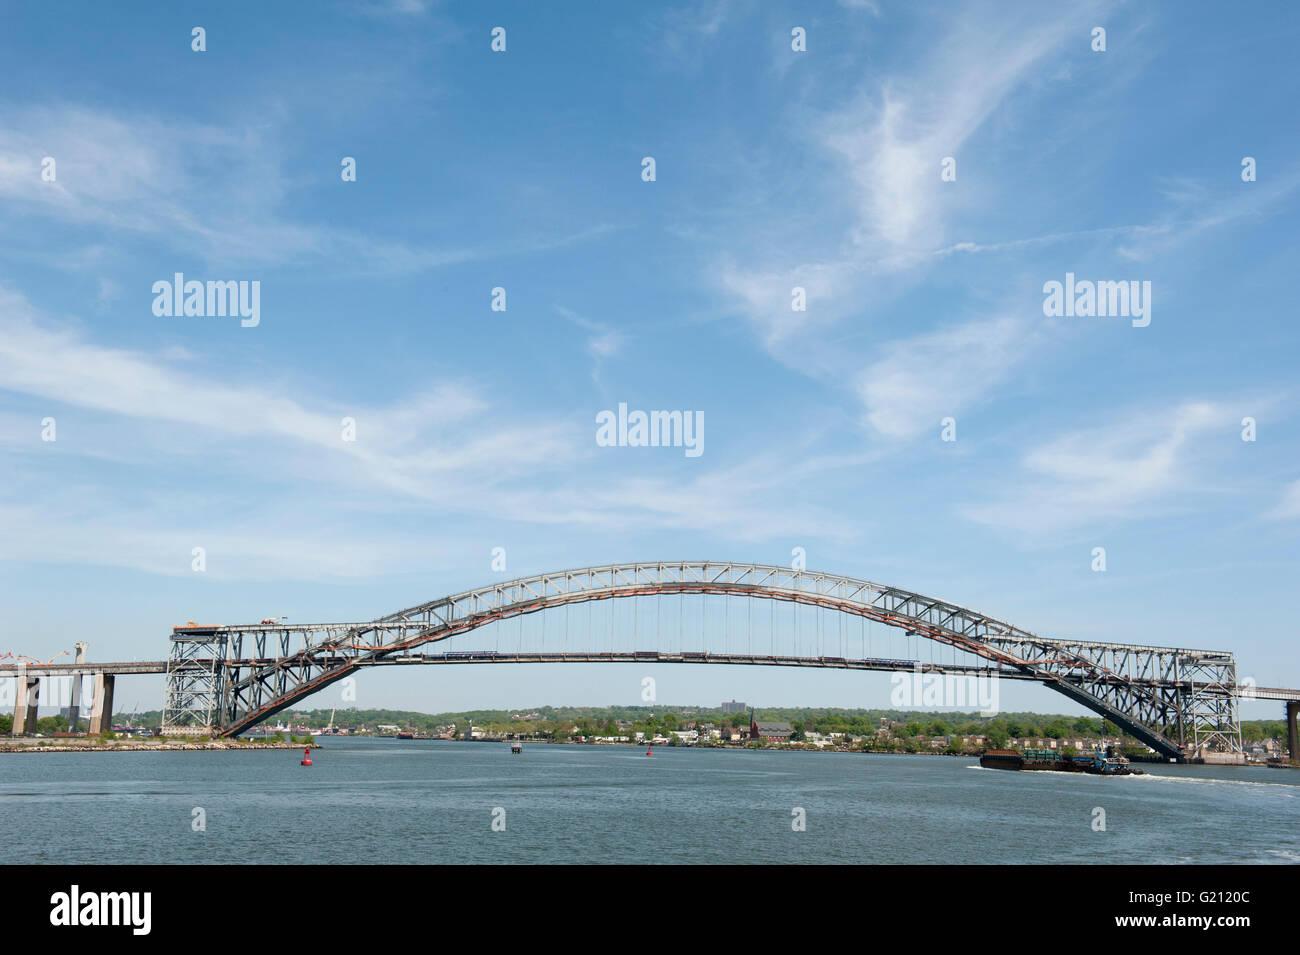 The landmarked Bayonne Bridge, which spans the Kill van Kull between Bayonne, N.J. and Staten Island, opened in - Stock Image